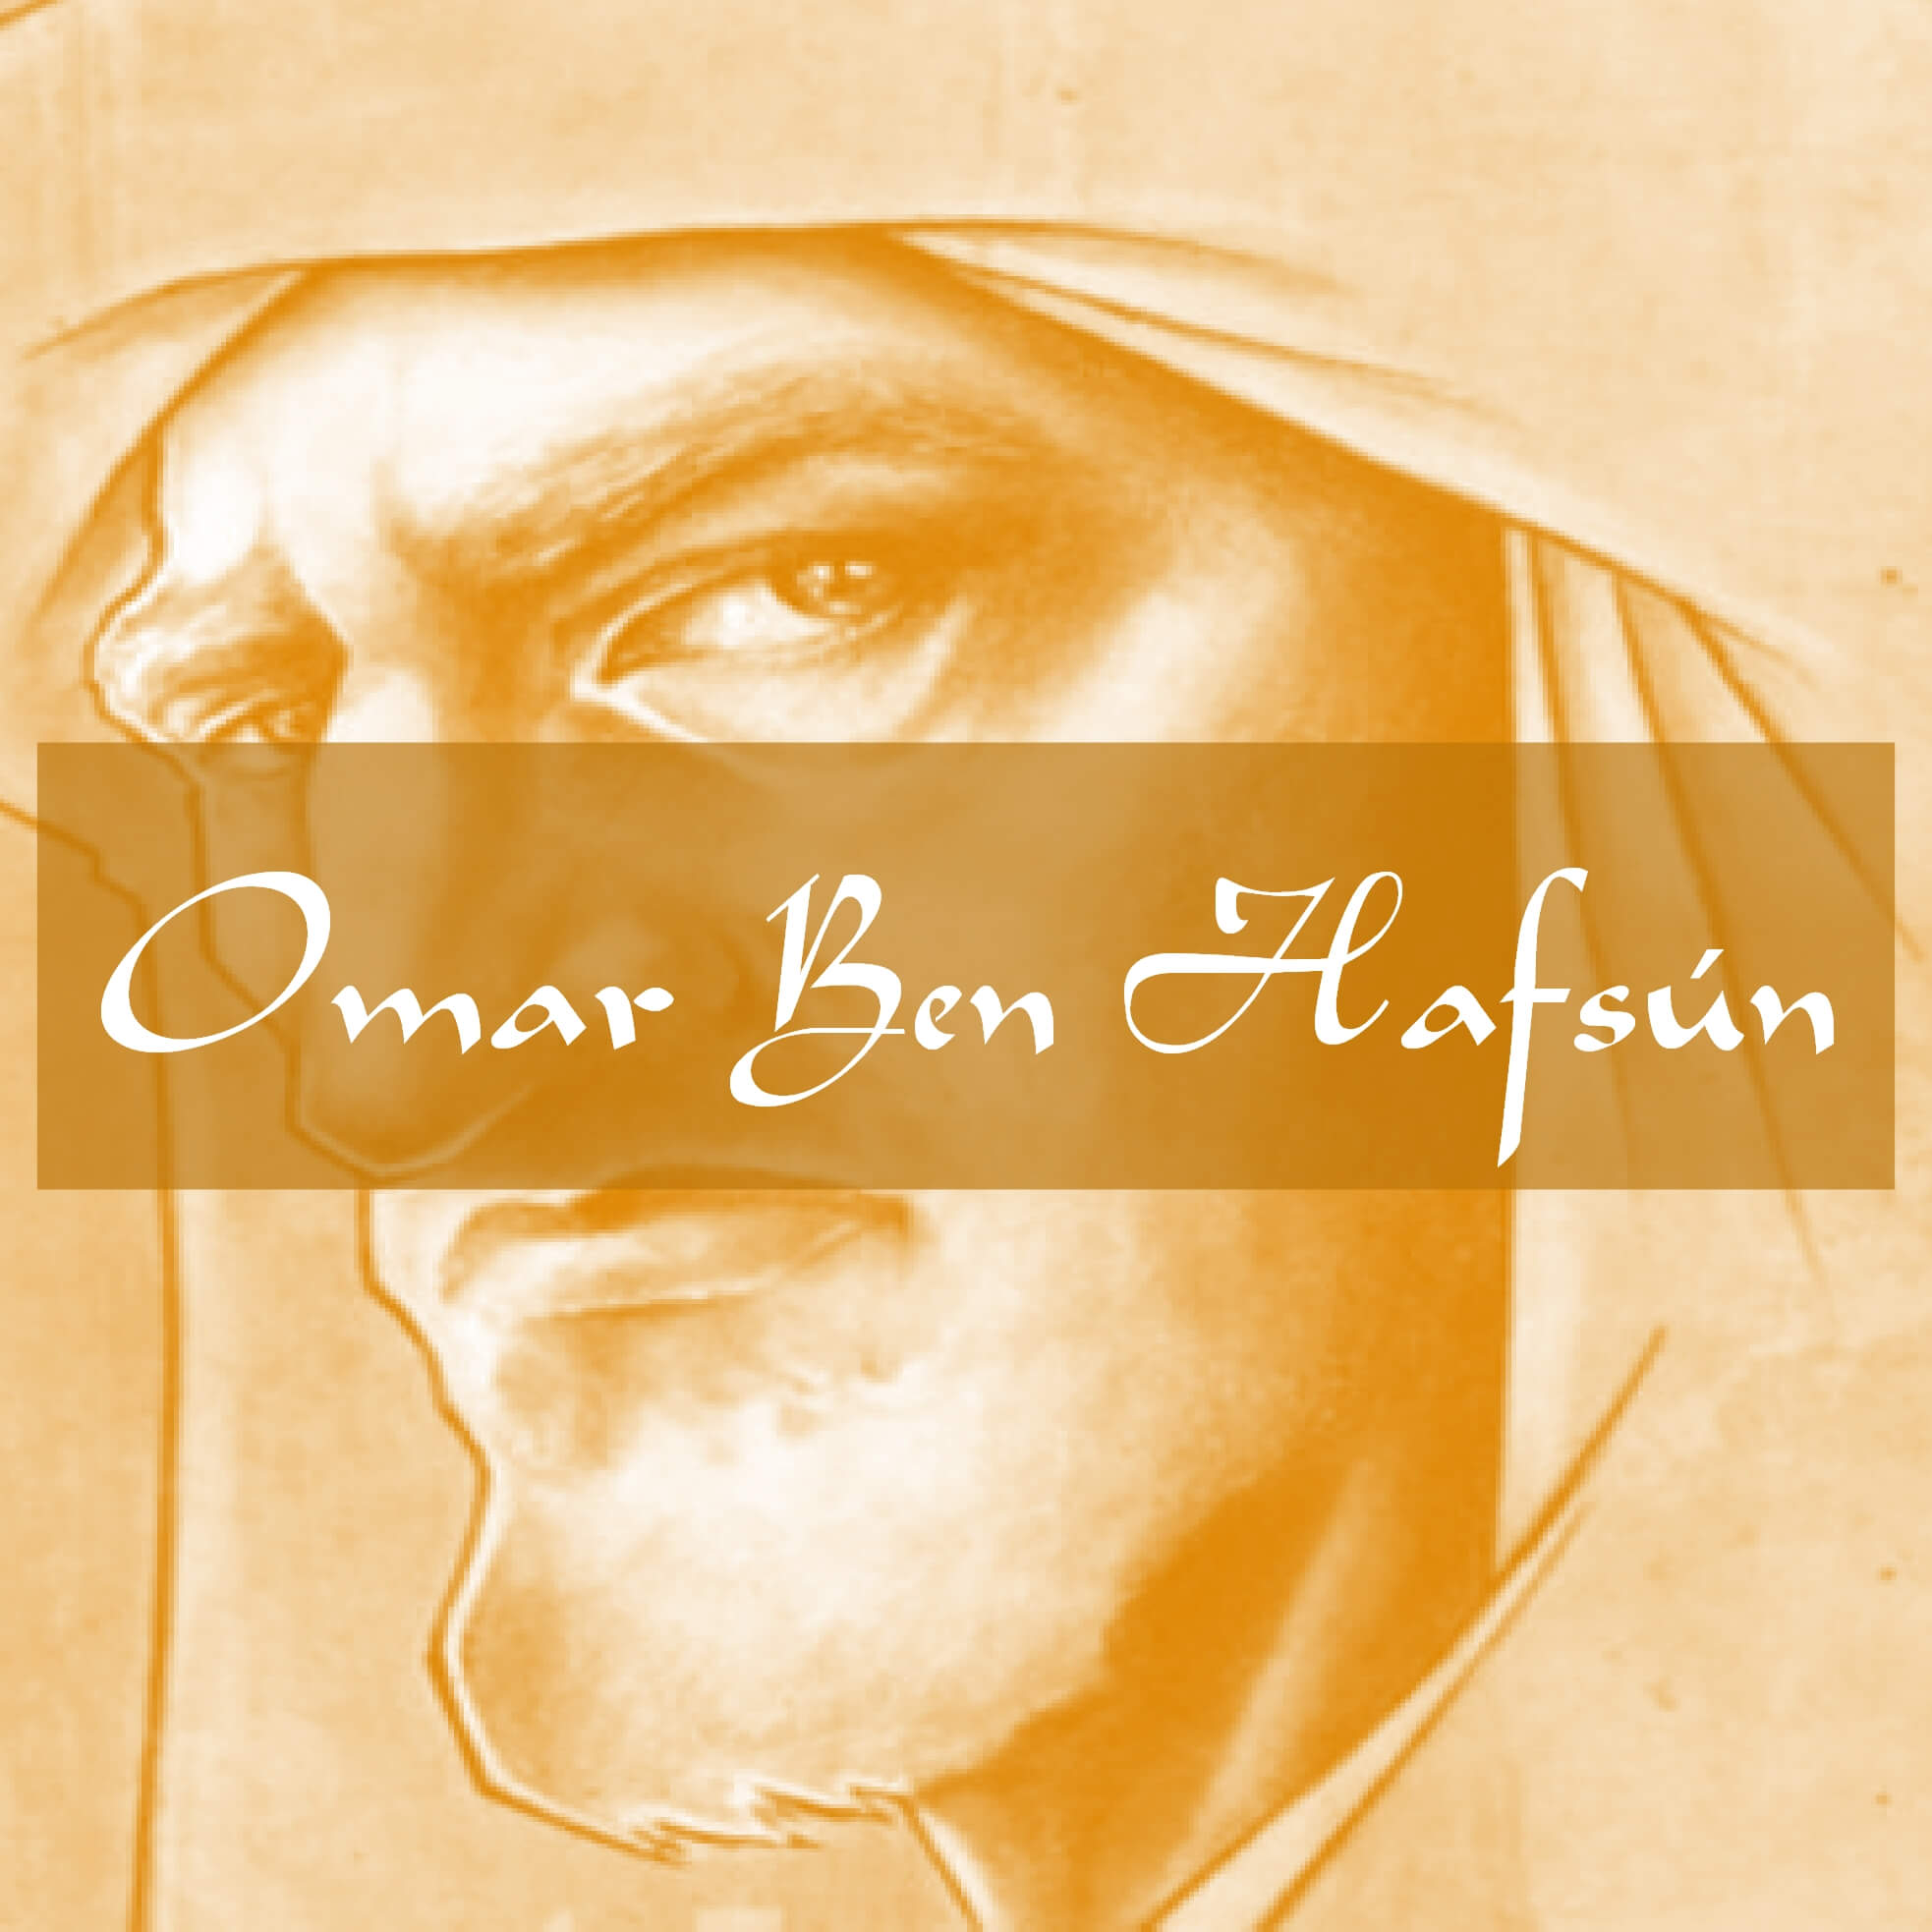 Omar Ben Hafsun Parauta History Malaga